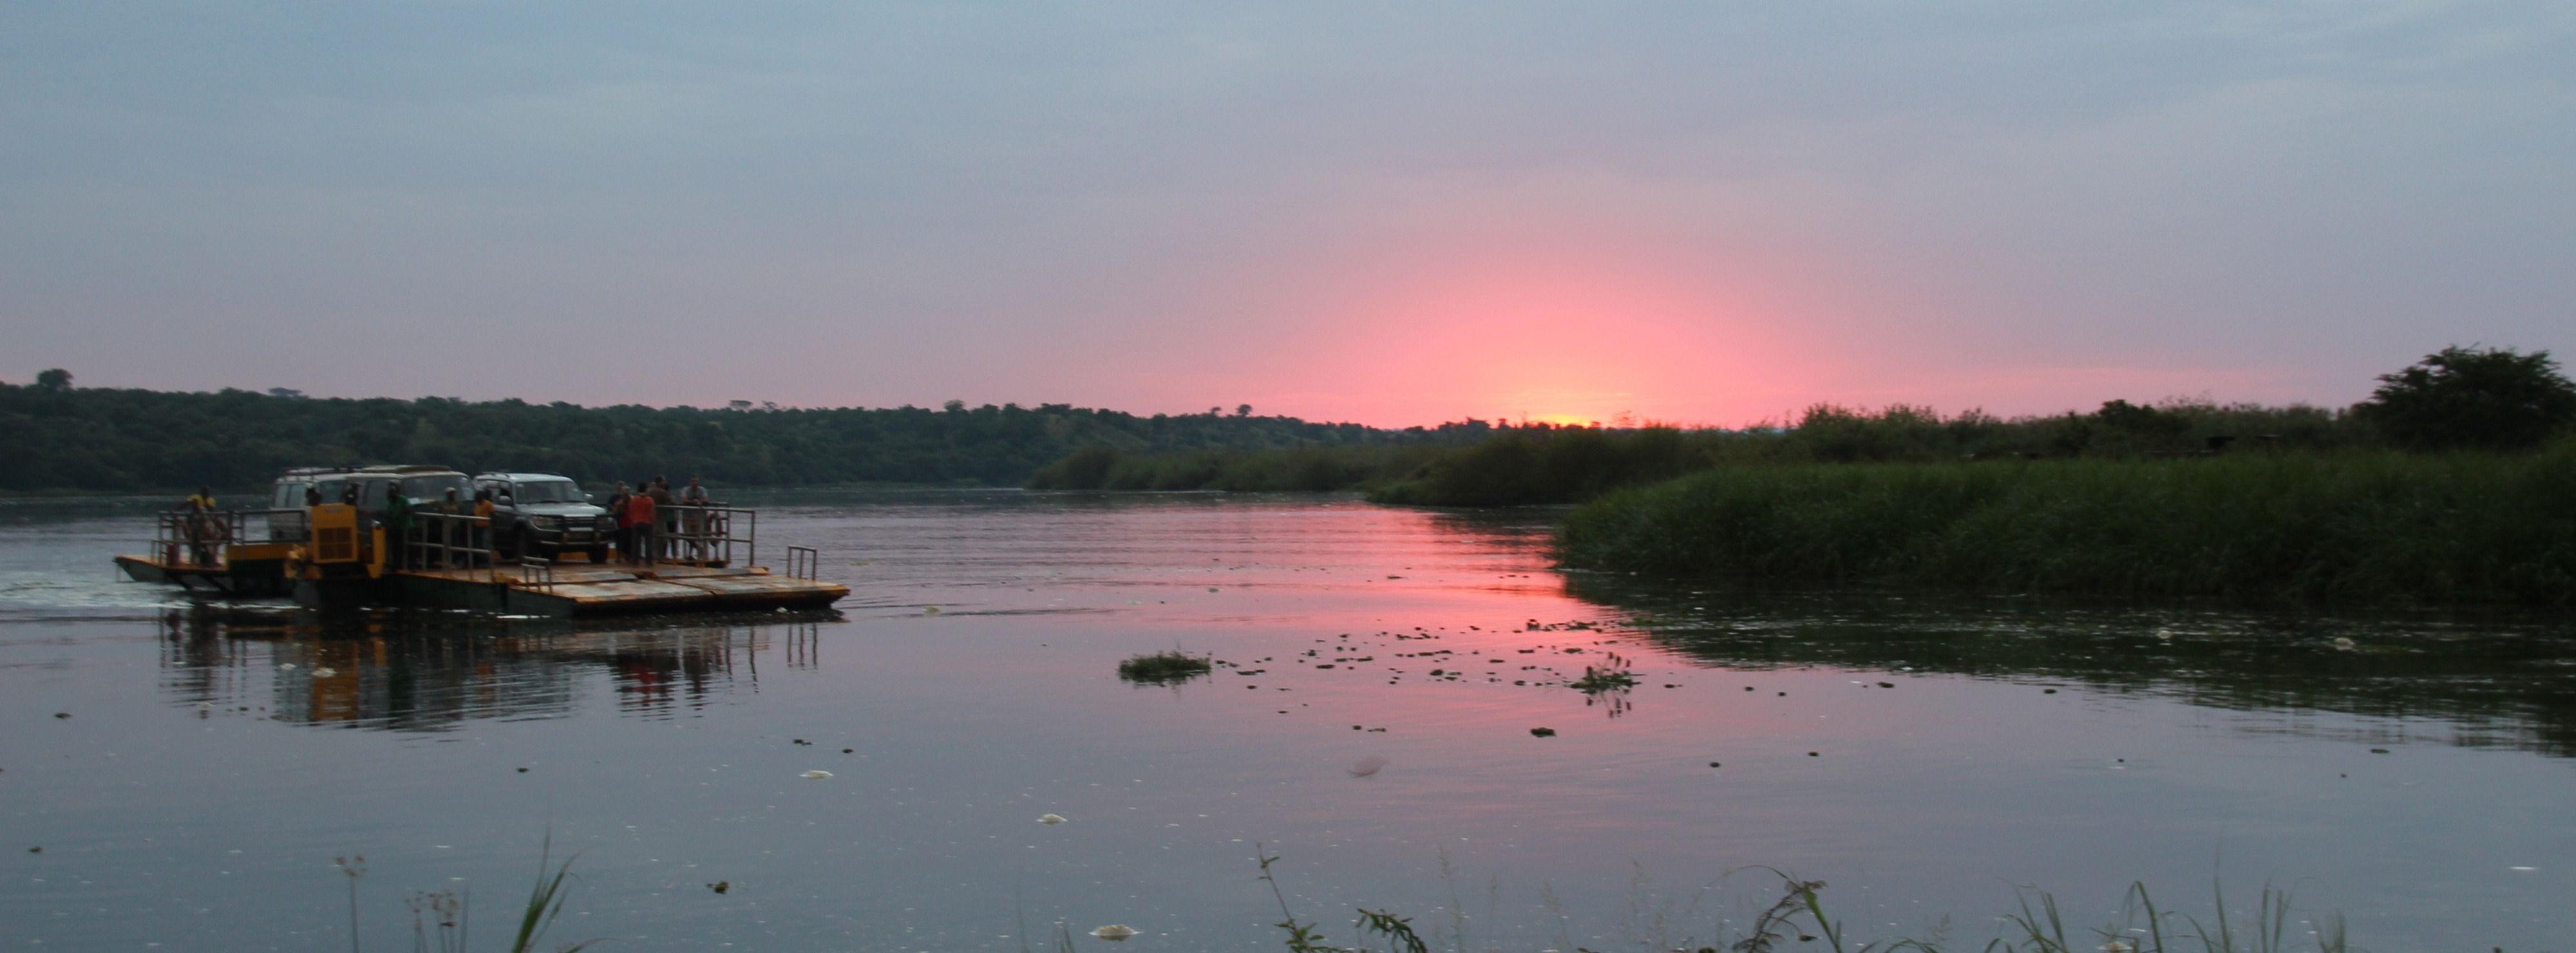 Nile River, Murchison Falls, Uganda